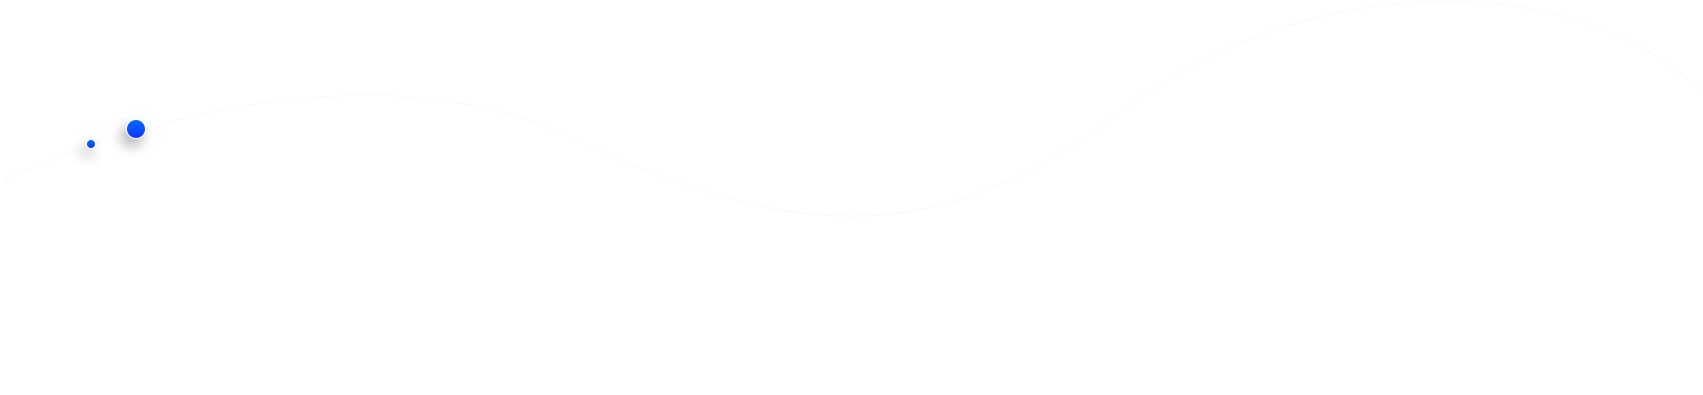 horizontal shape